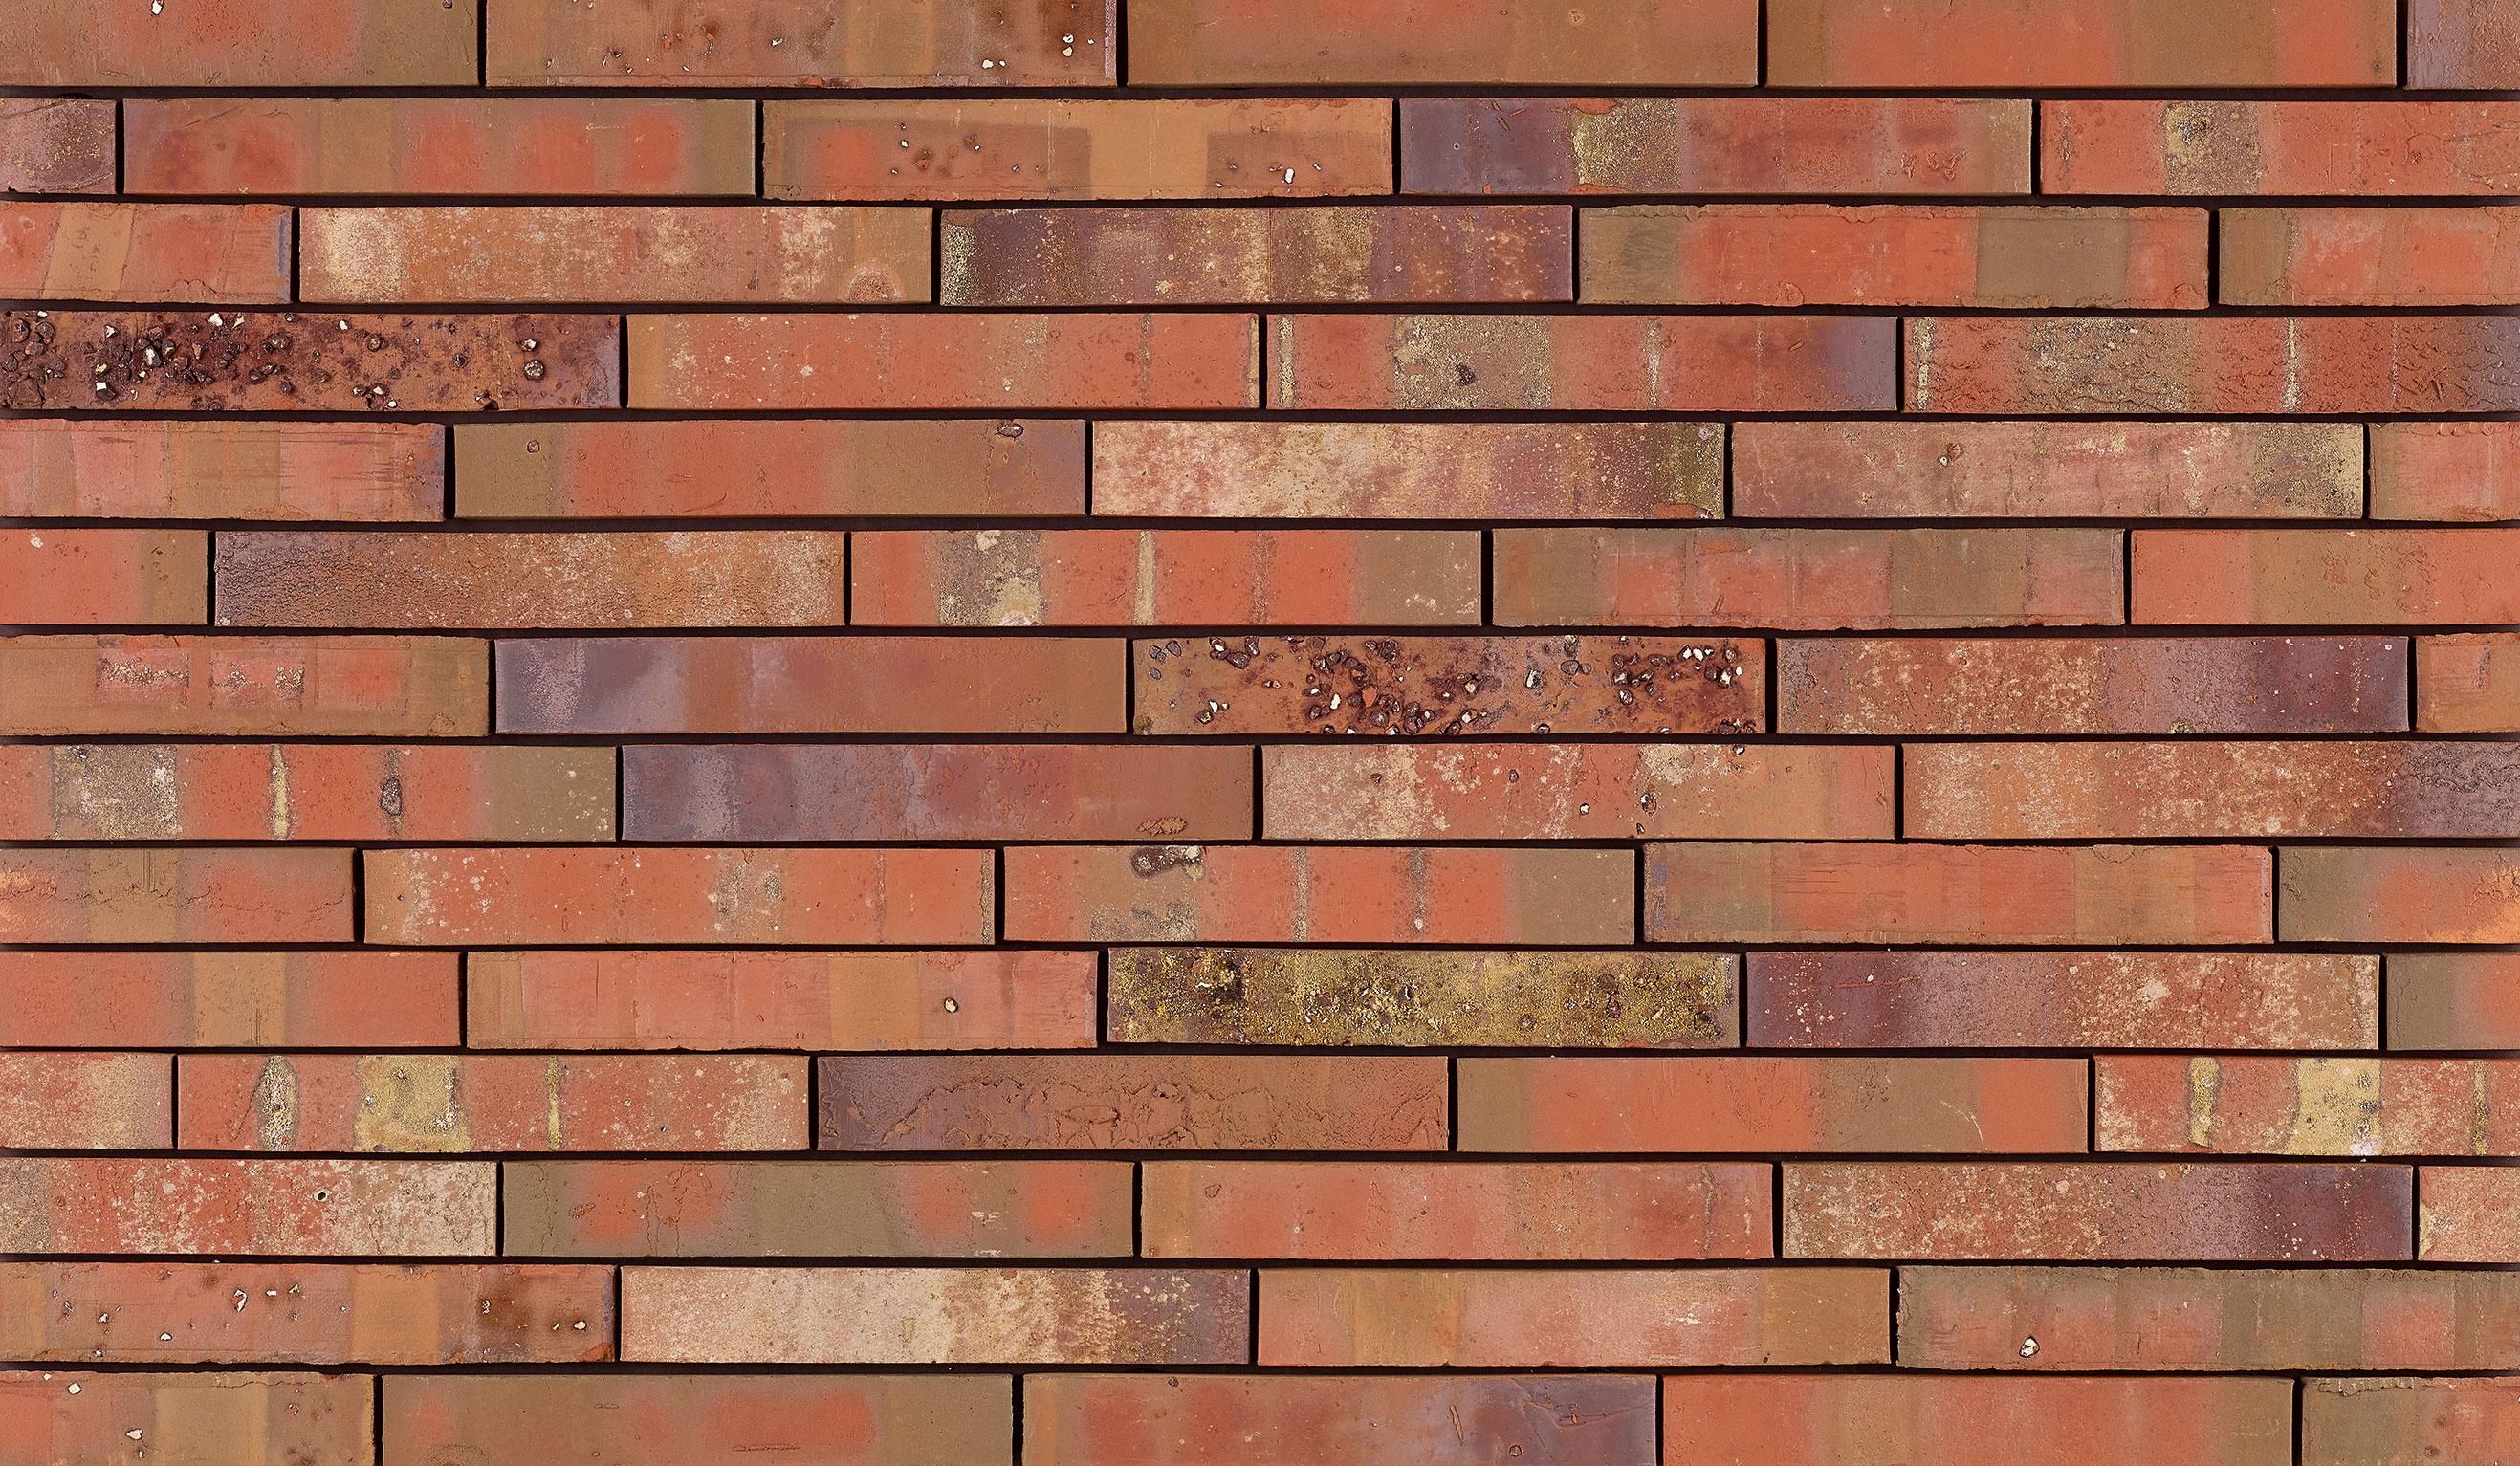 ditail-materiales-wienerberger-_ter_2018_archipolis-volt-rood_cmyk_crop_001